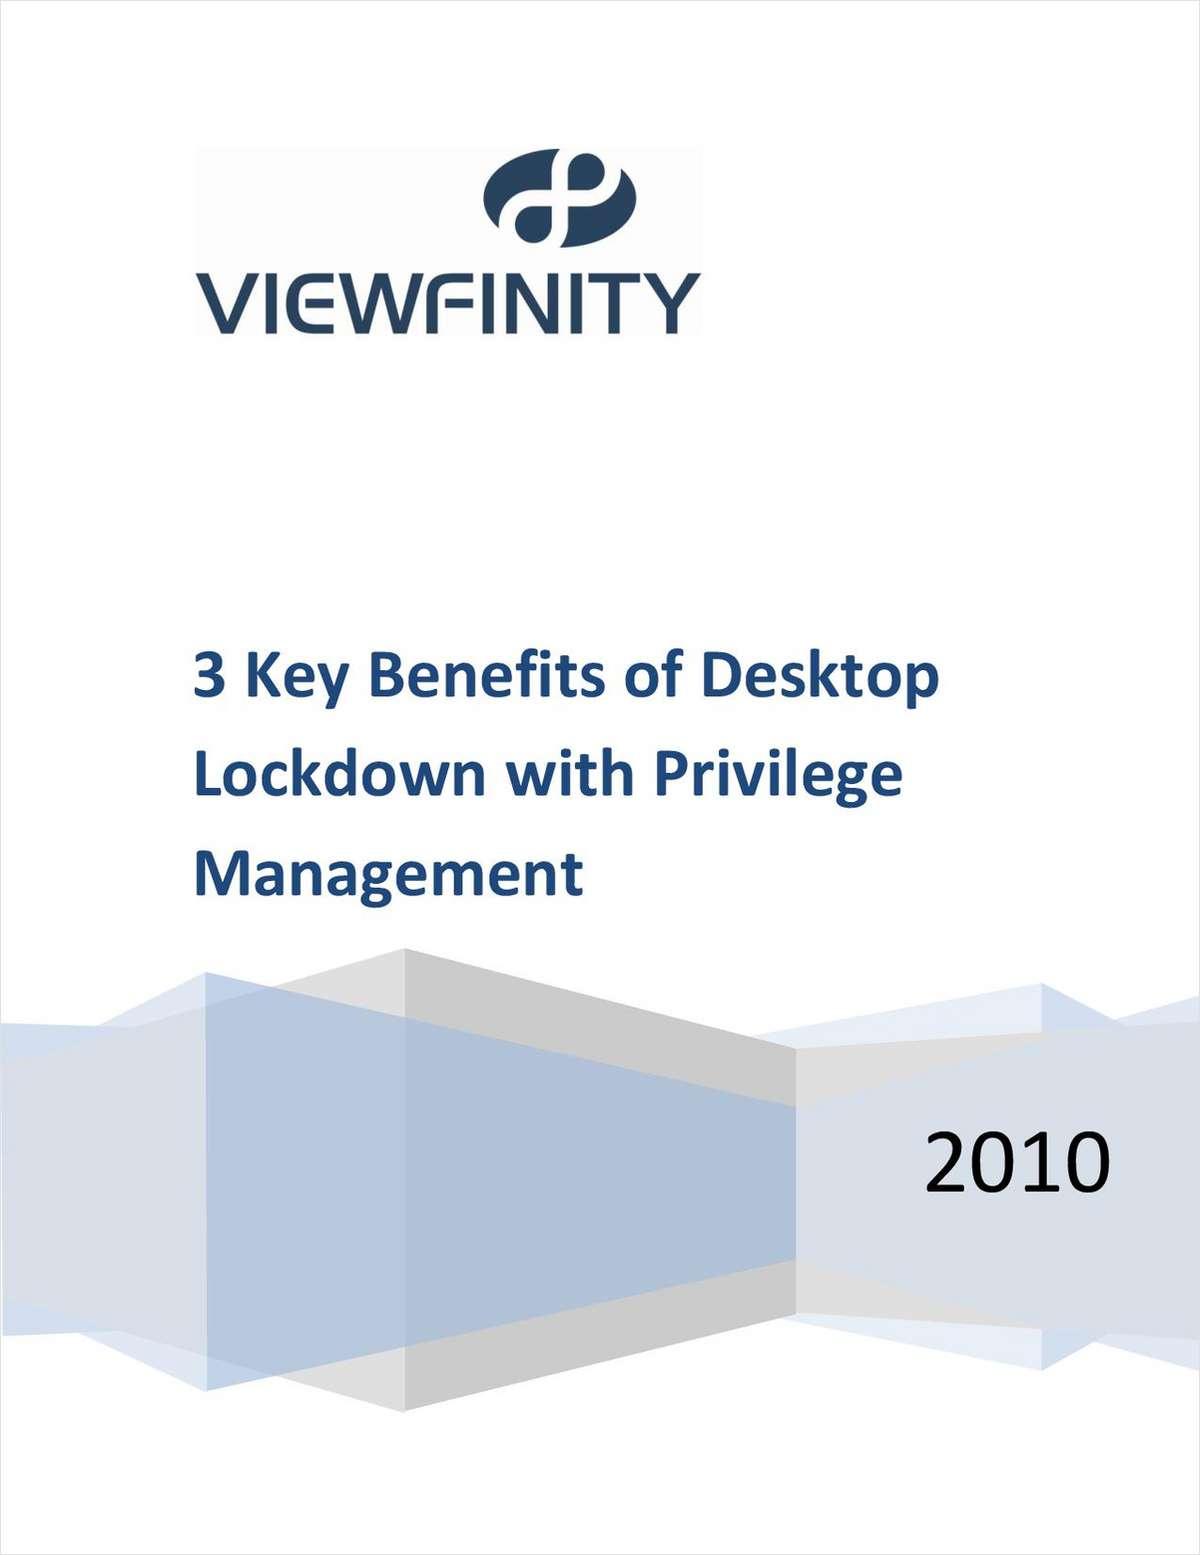 3 Key Benefits of Desktop Lockdown with Privilege Management